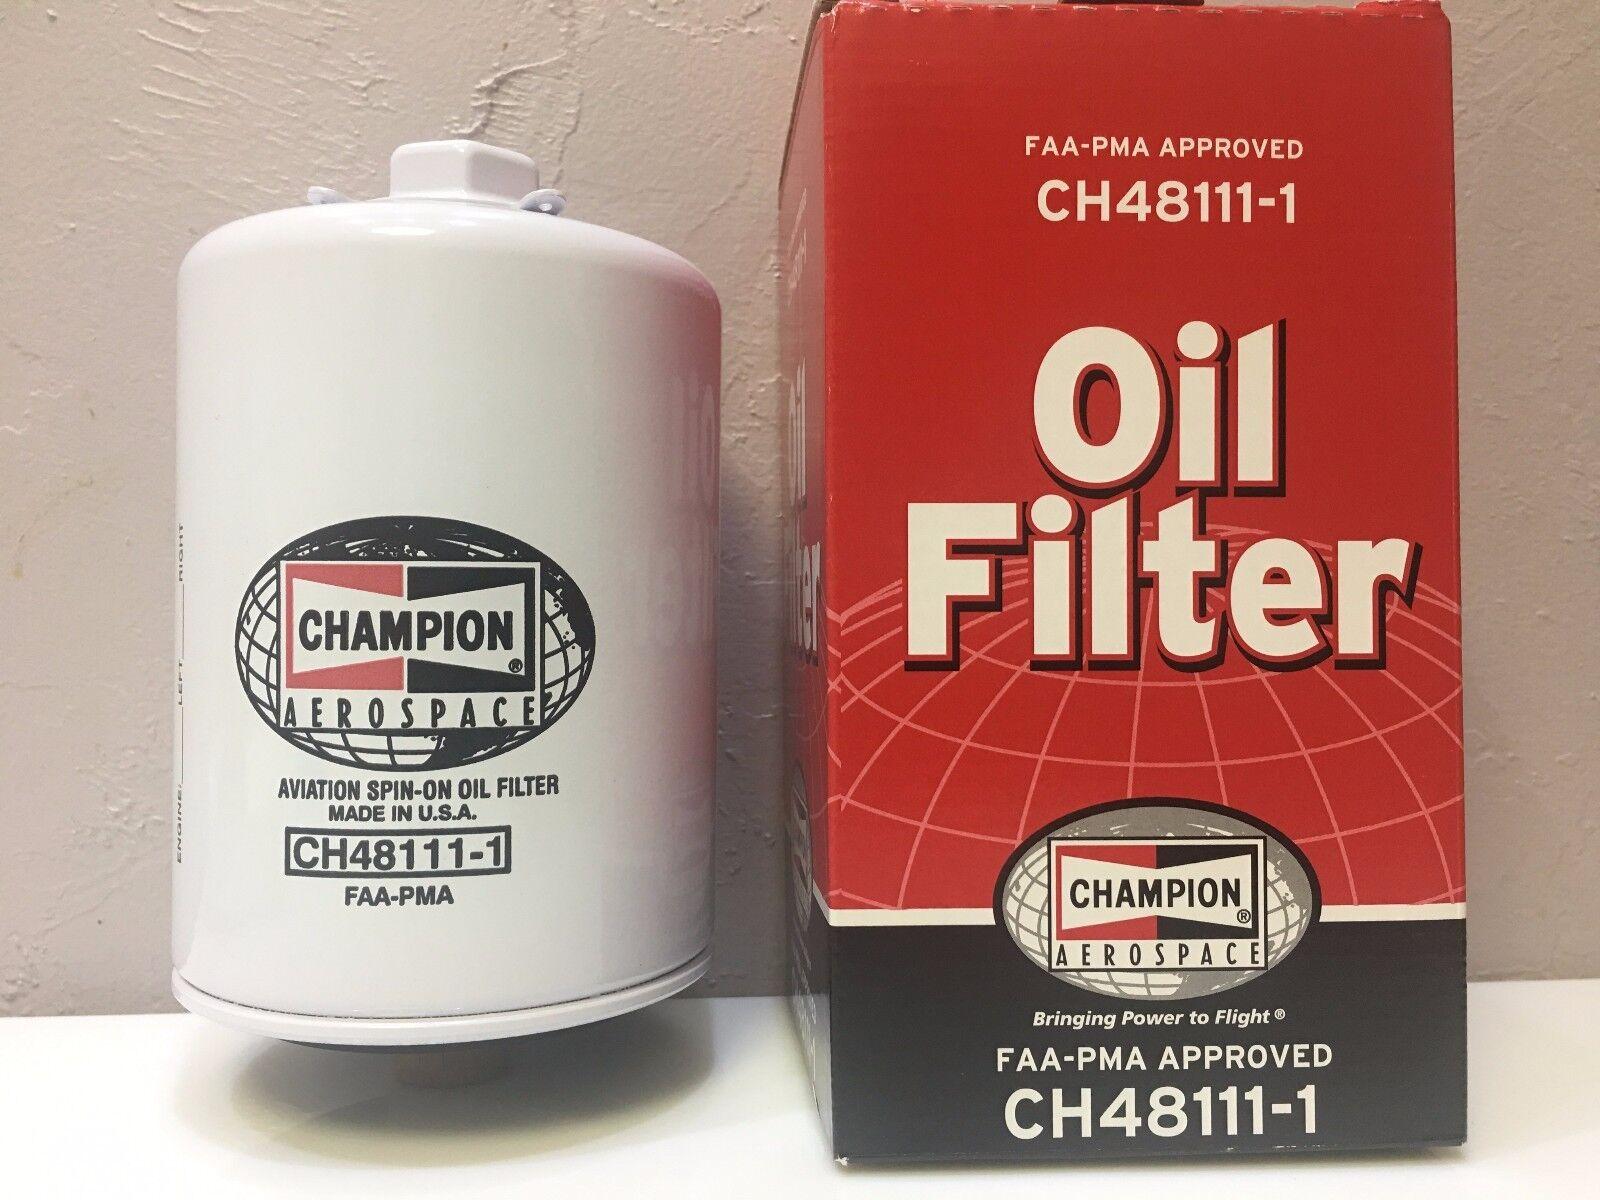 BRAND NEW CHAMPION AIRCRAFT OIL FILTER p/n CH48111-1 w/ FAA-PMA 8130 Certs